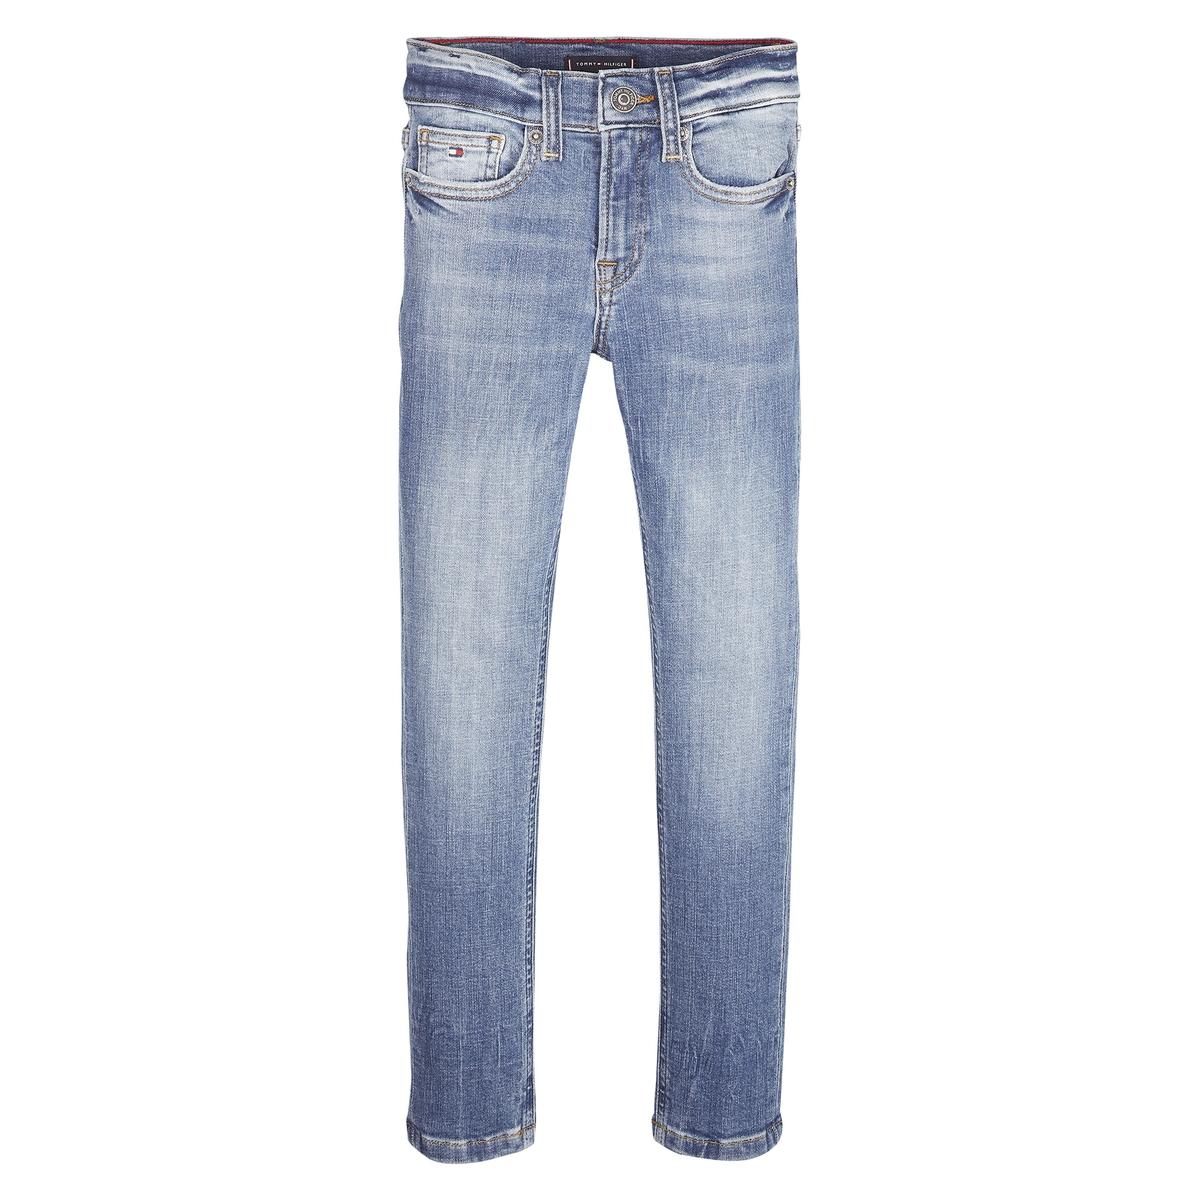 Jeans slim, 12-16 anos